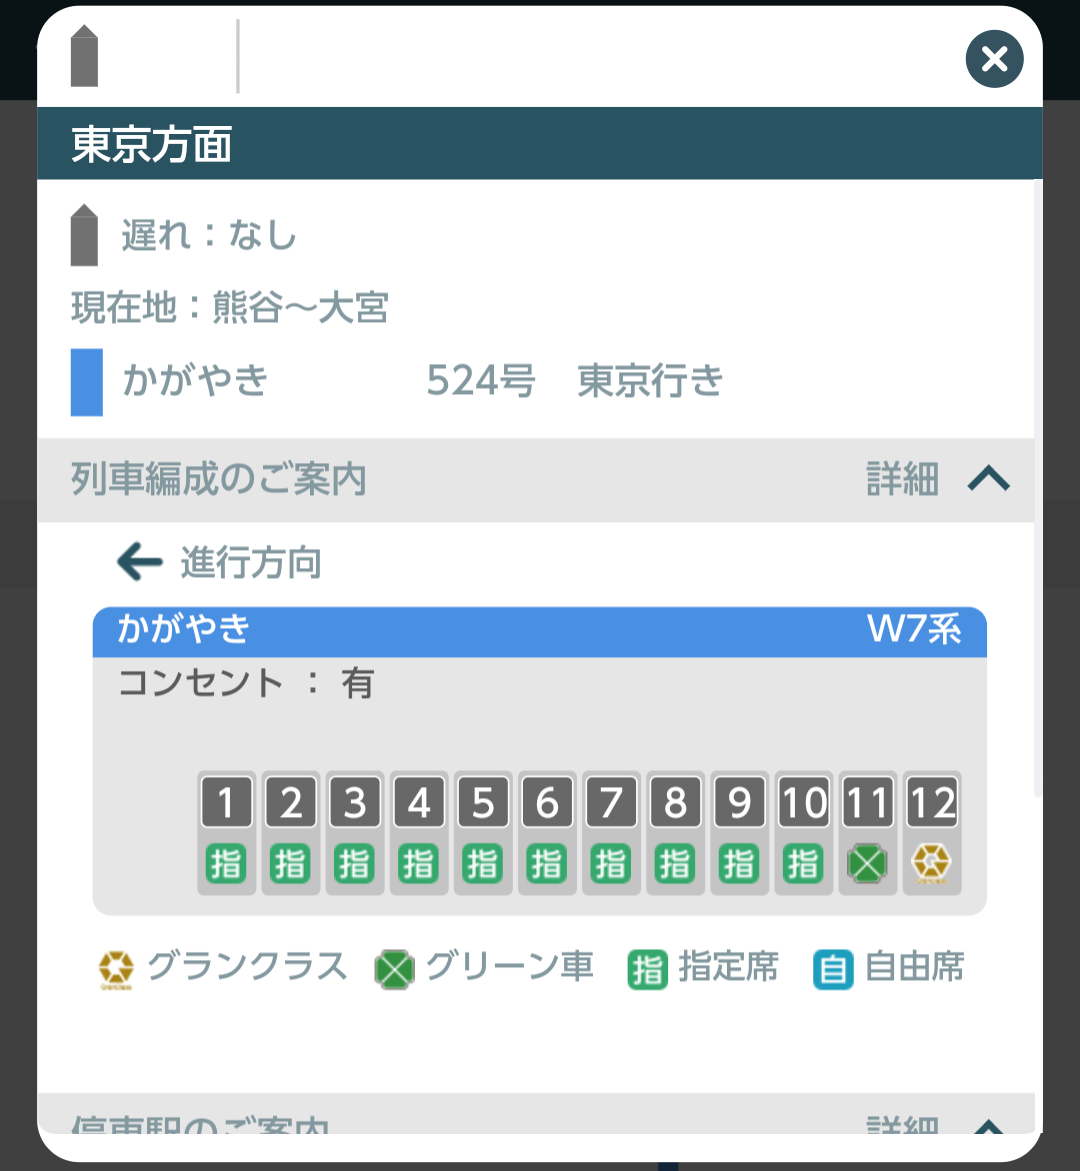 JR東日本アプリの列車走行位置表示>列車詳細からわかる編成W7系